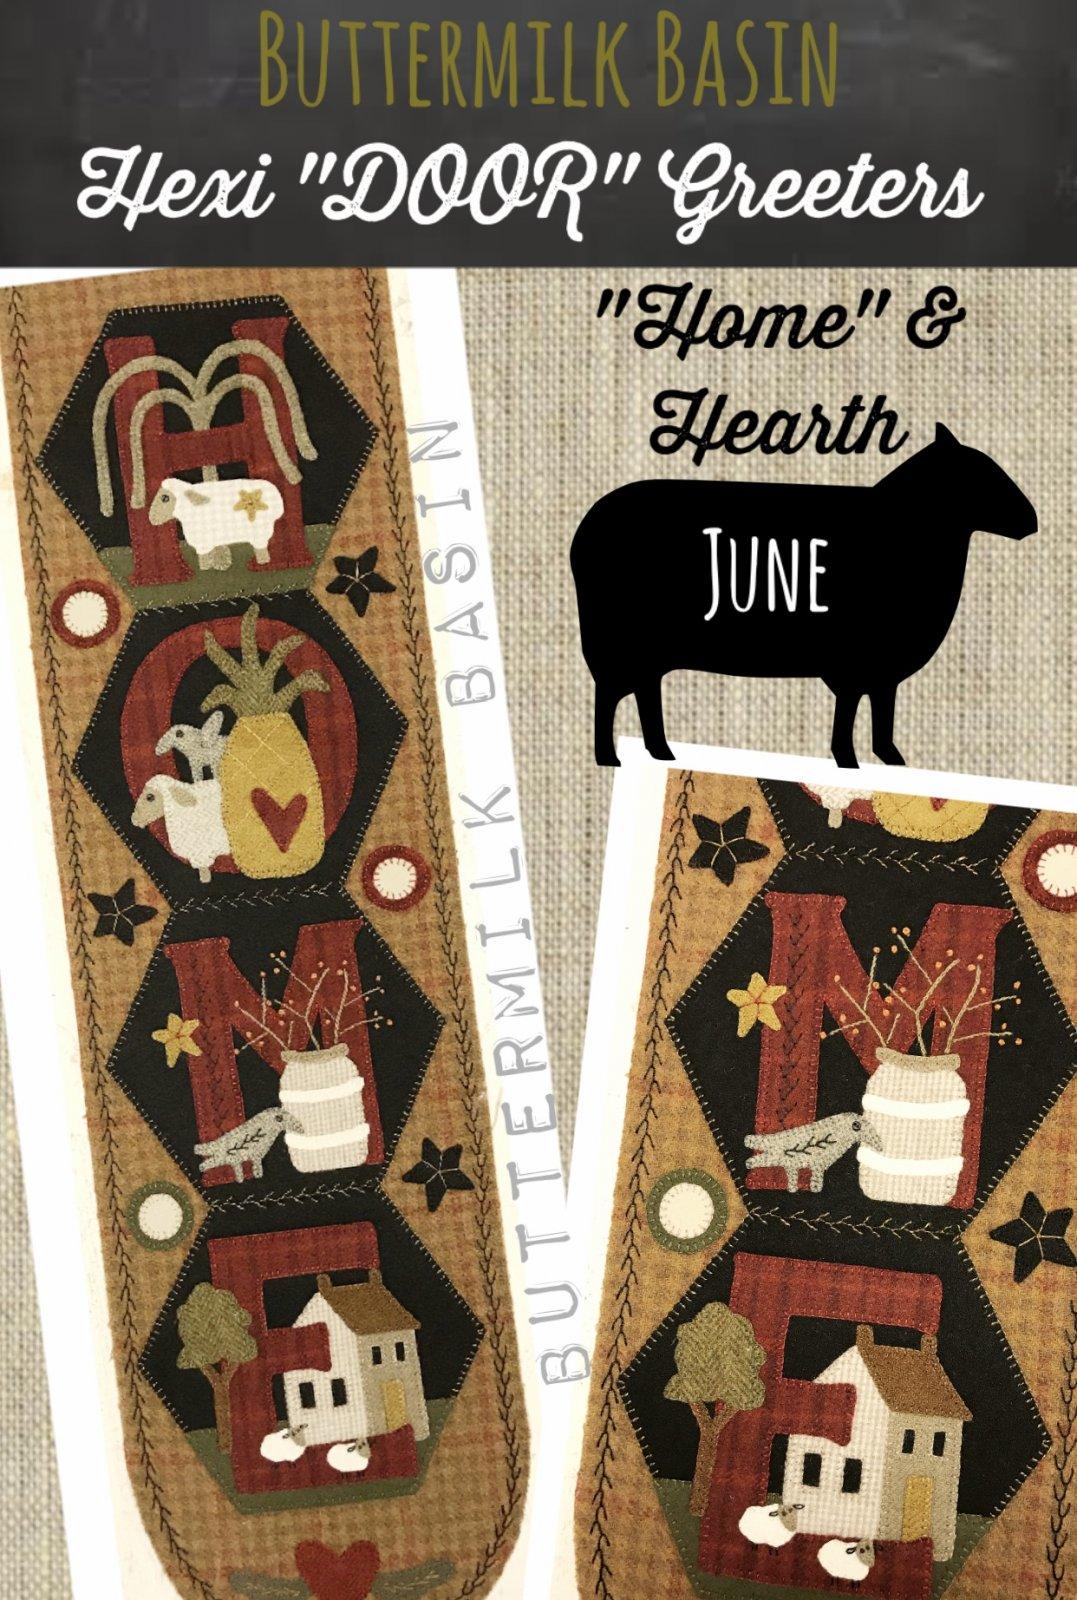 A Year of Hexi WORD Door Greeters * June Pattern